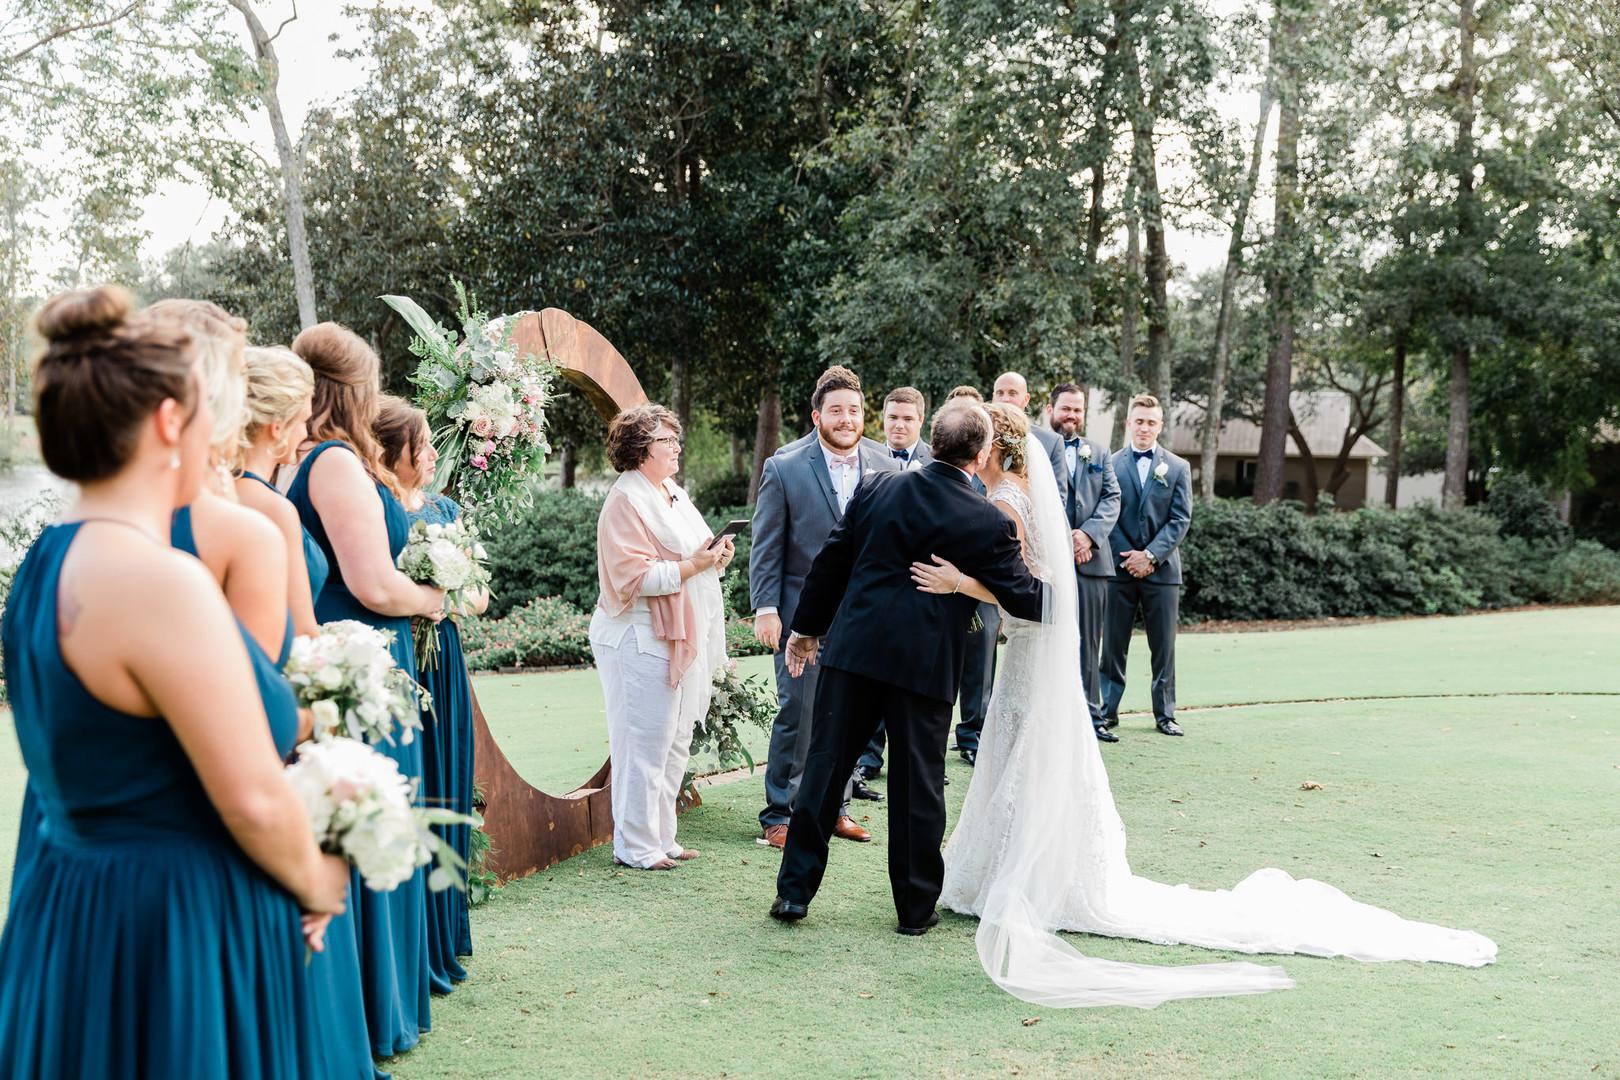 pawleys-plantation-wedding-16.jpg